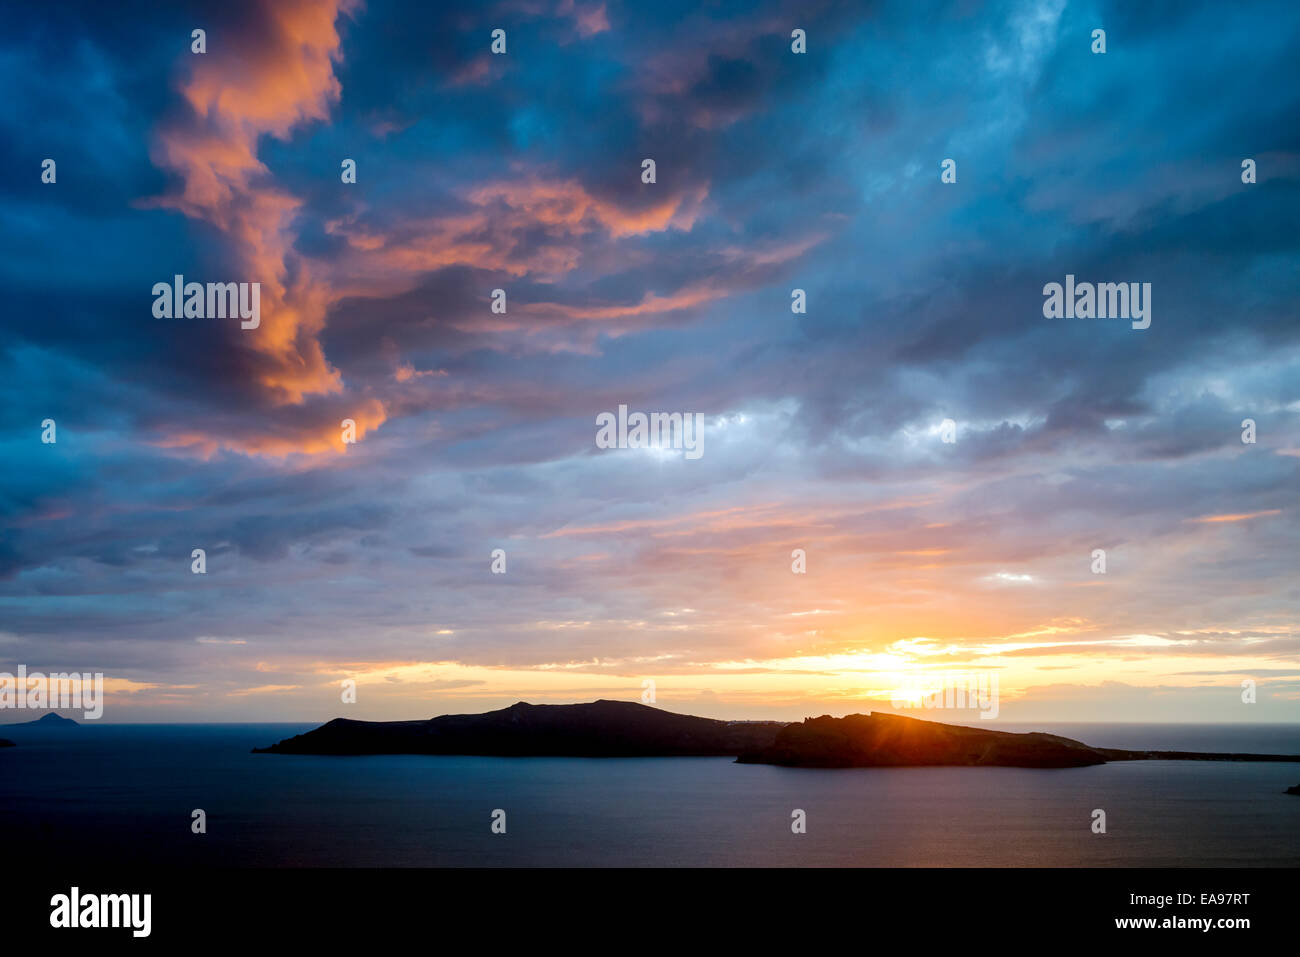 Spectacular sunset over the Aegean volcanic island caldera